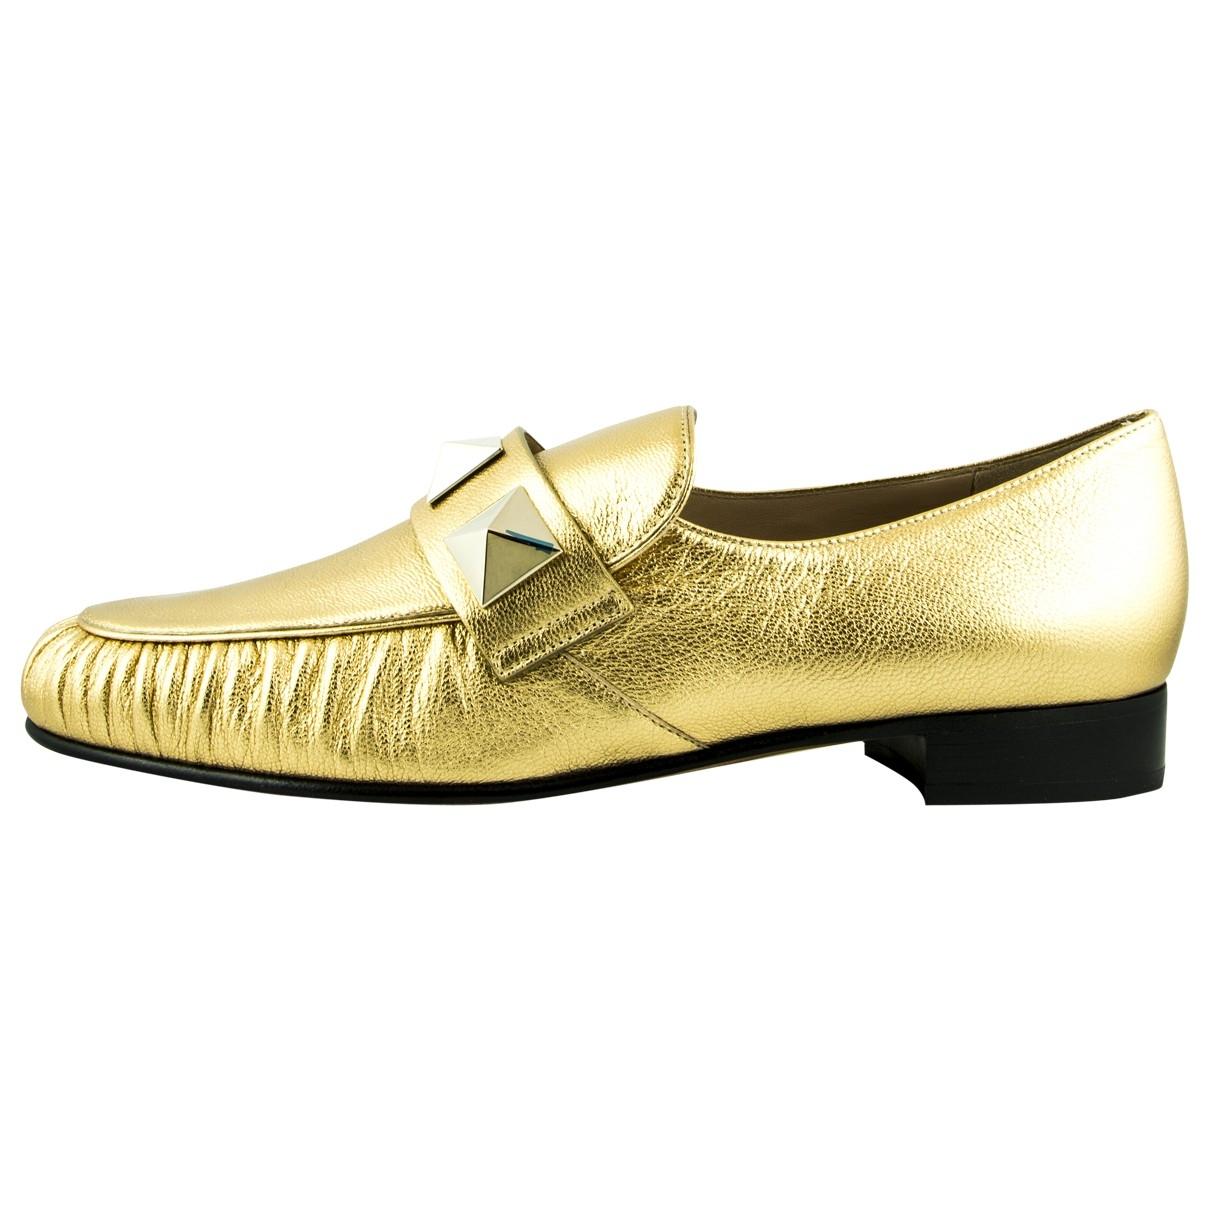 Valentino Garavani Rockstud Gold Leather Flats for Women 38 EU